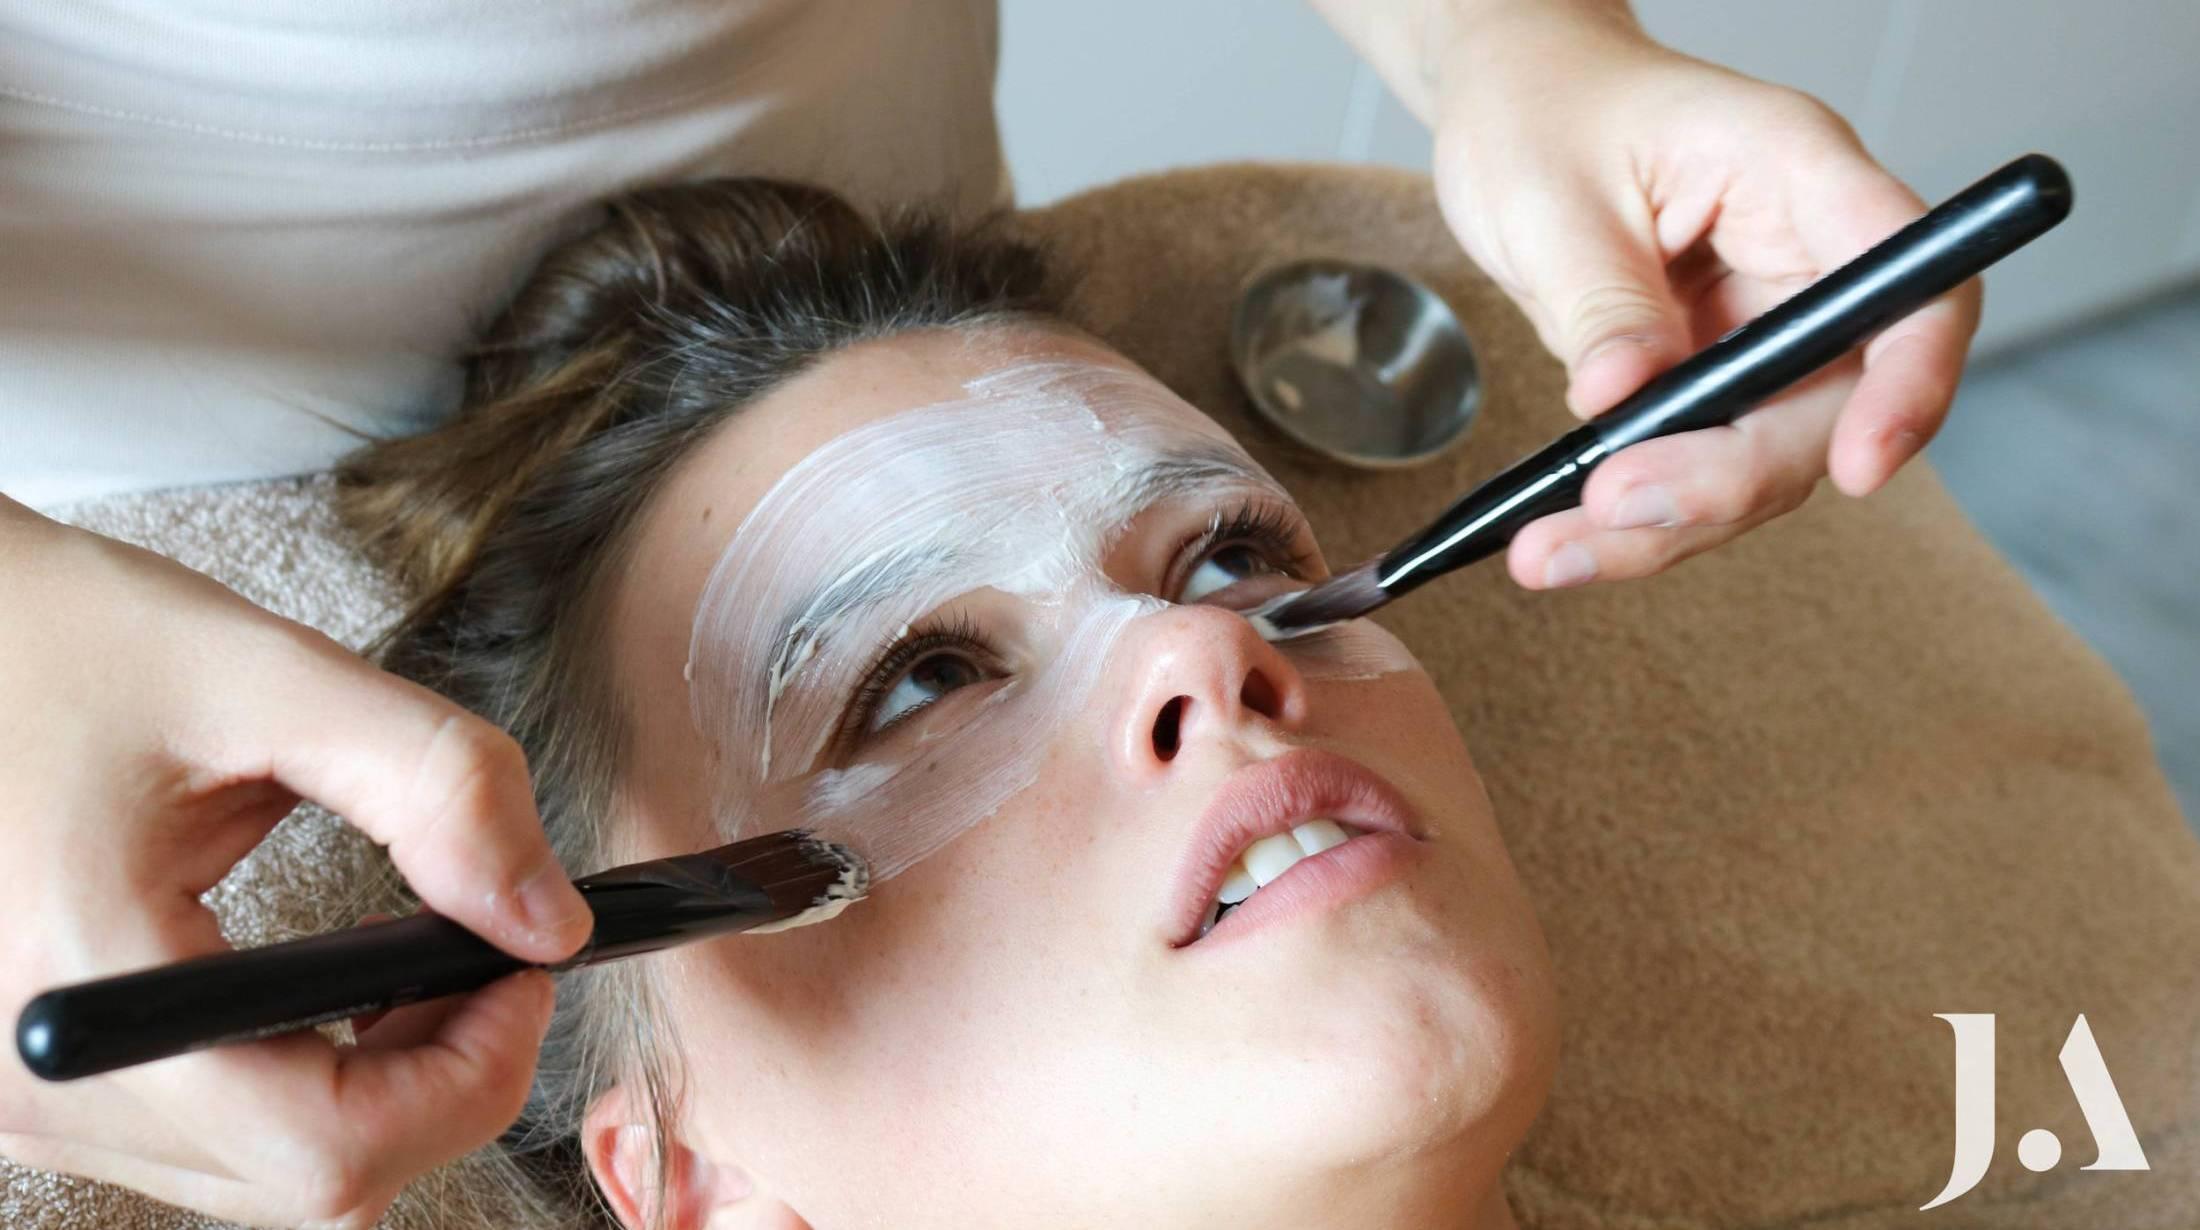 Behandeling huidverbeterende gelaatsverzorging Juliette Armand